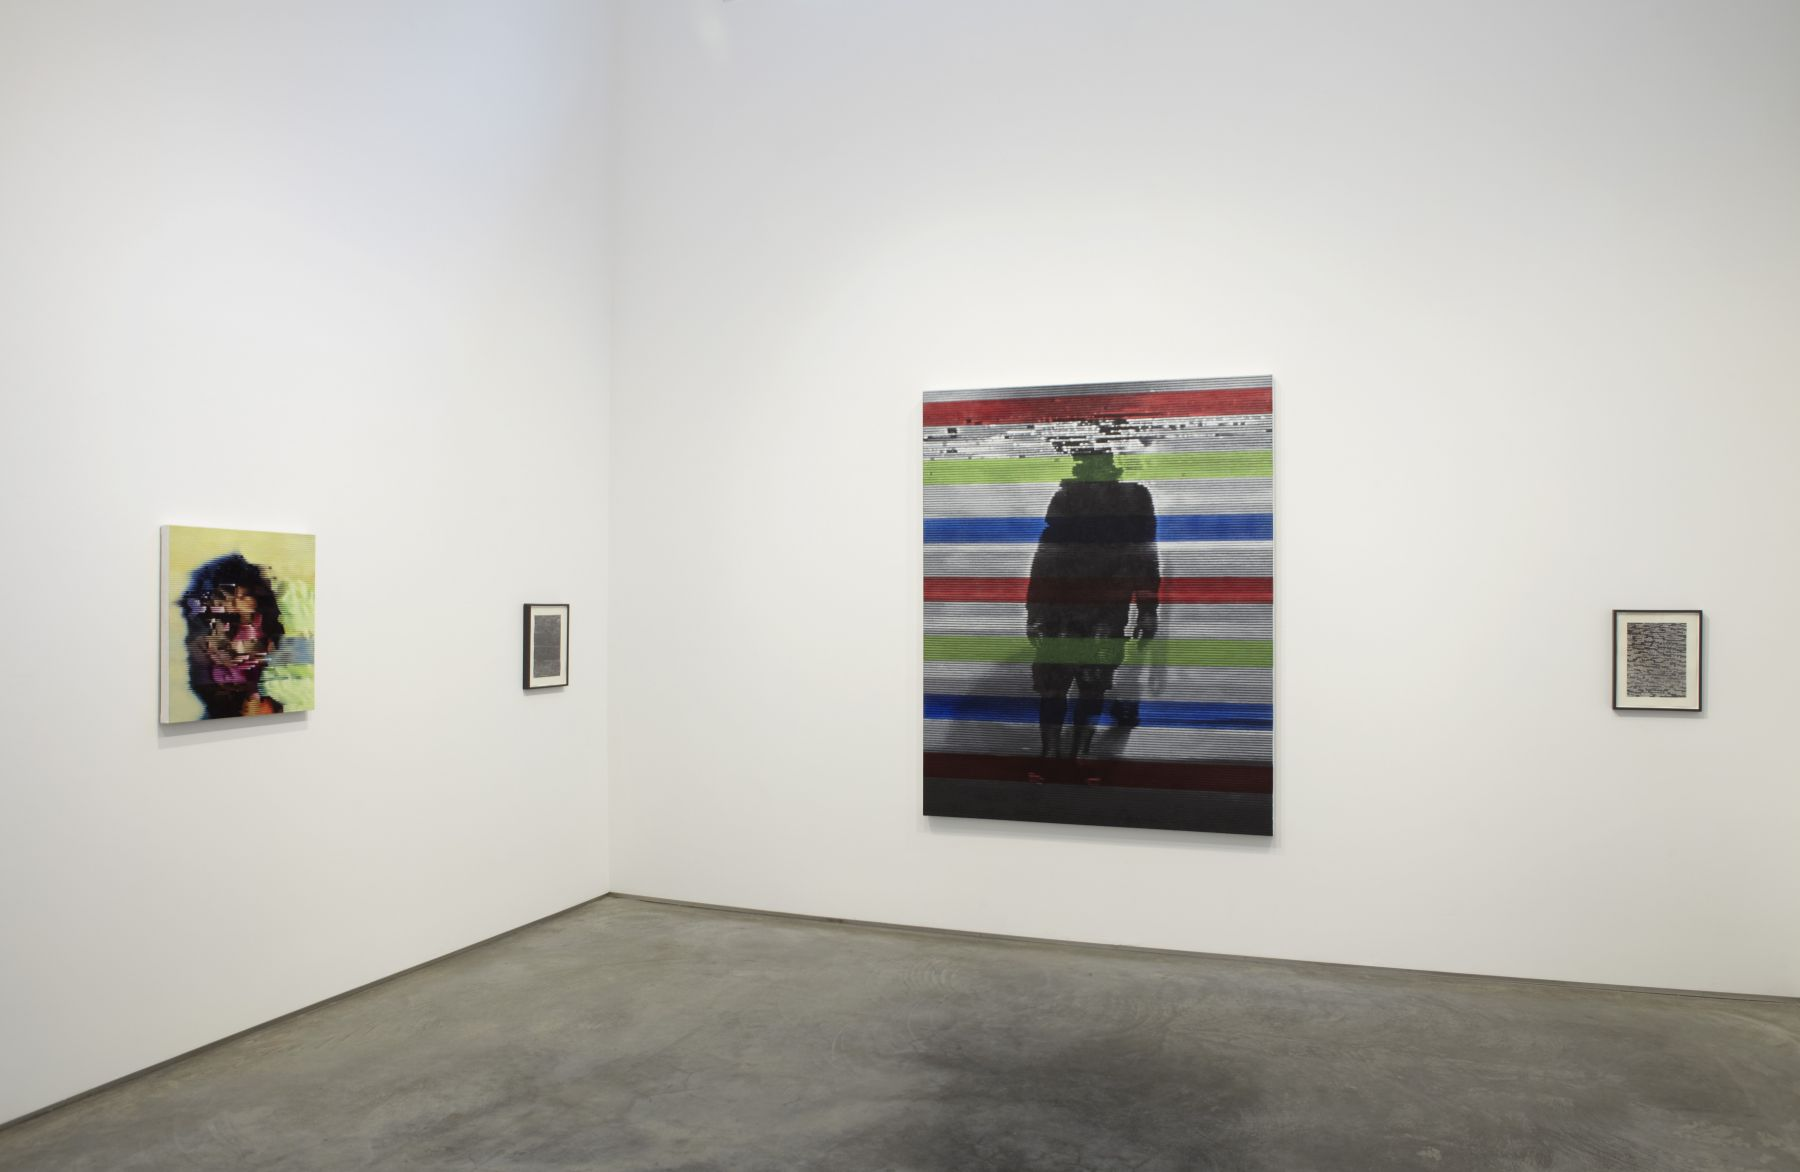 Signali (Installation View), Marianne Boesky Gallery, 2010